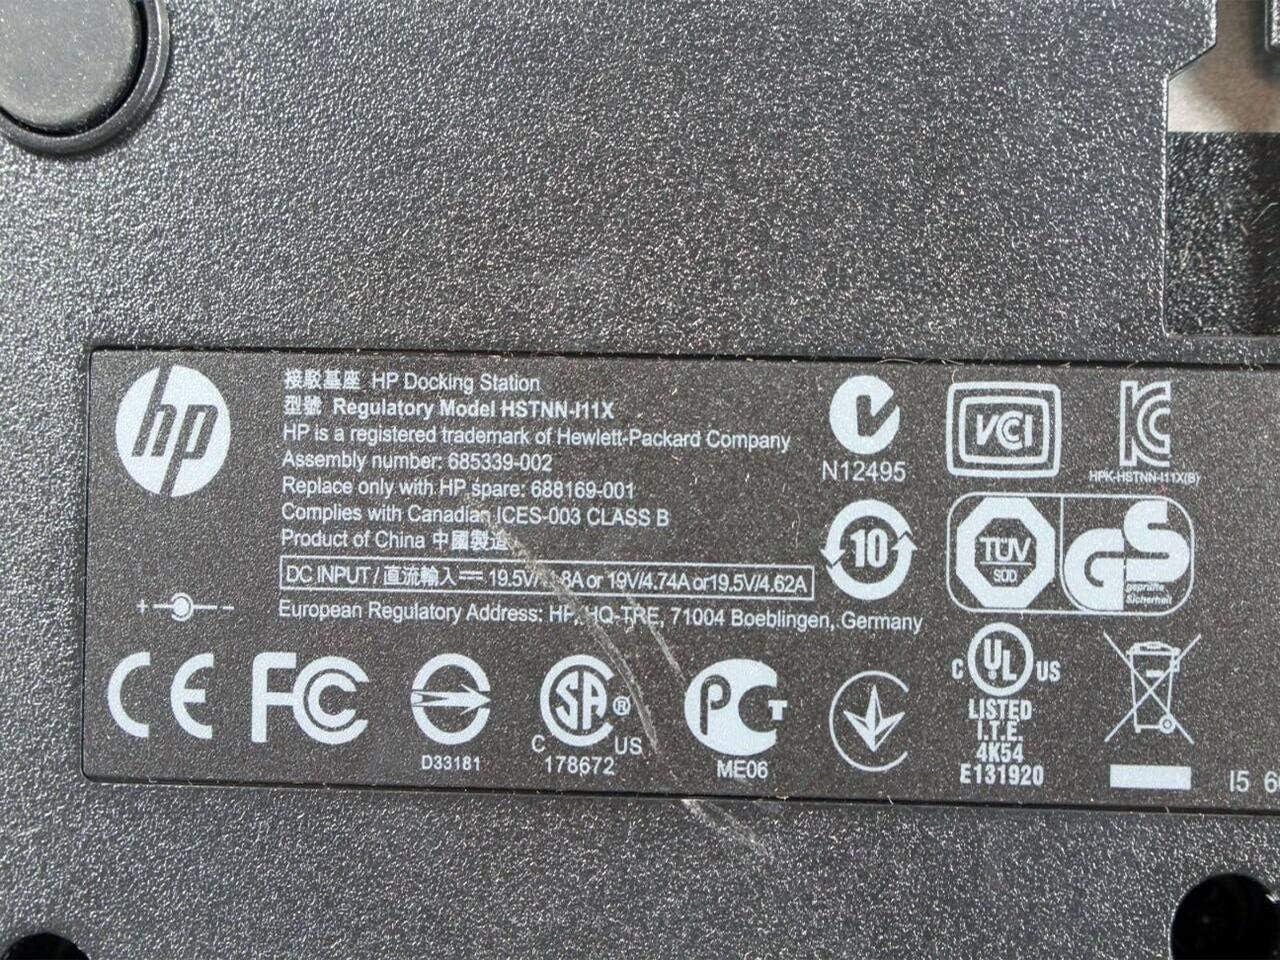 HP Compaq EliteBook 8440p Docking Station HSTNN-I11X 581597-001 HSTNN-111X Renewed